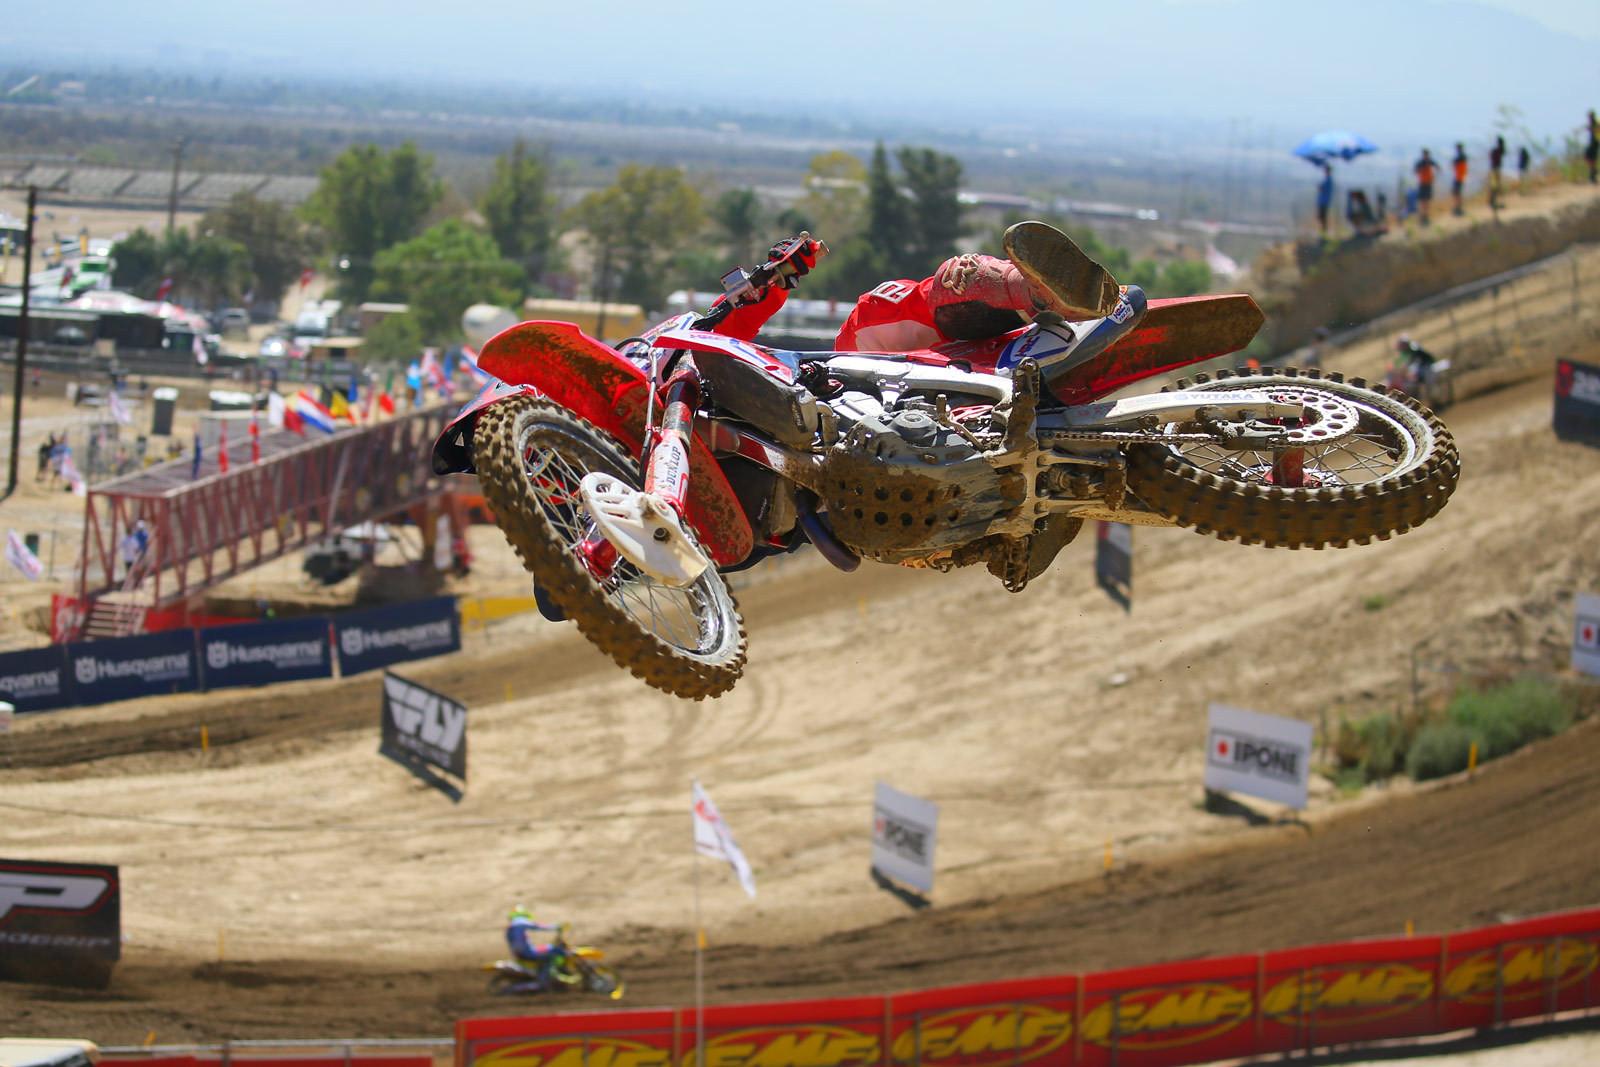 Evgeny Bobryshev - Photo Blast: MXGP of the USA - Motocross Pictures - Vital MX